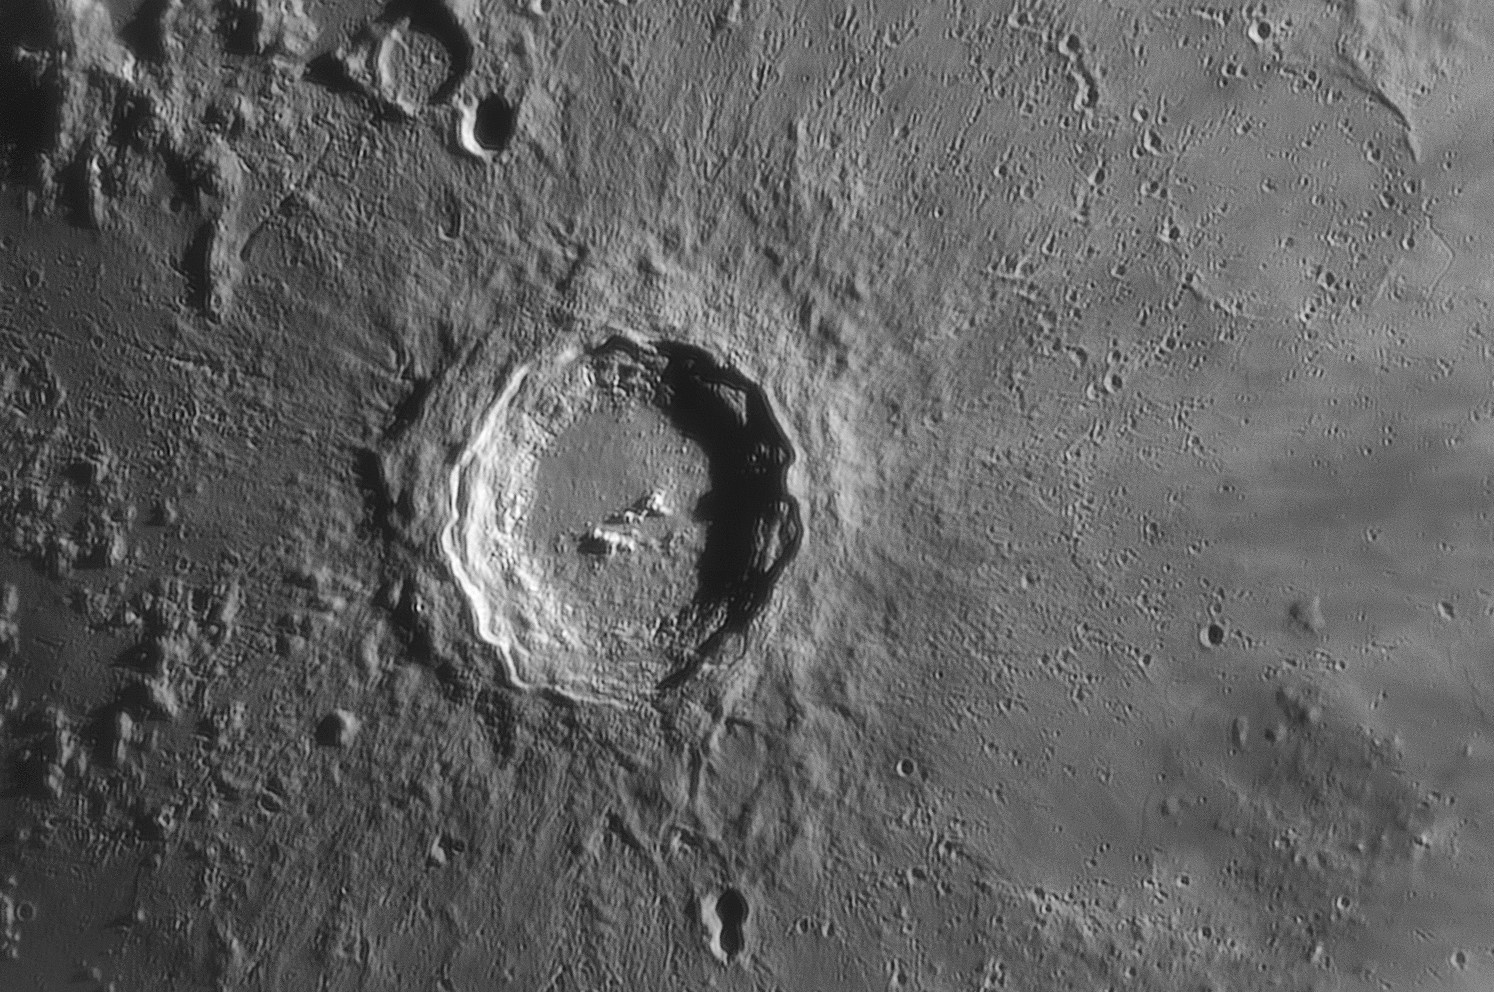 Kopernik 20190414_193430_g3_ap328_conv 1000 klpop.jpg